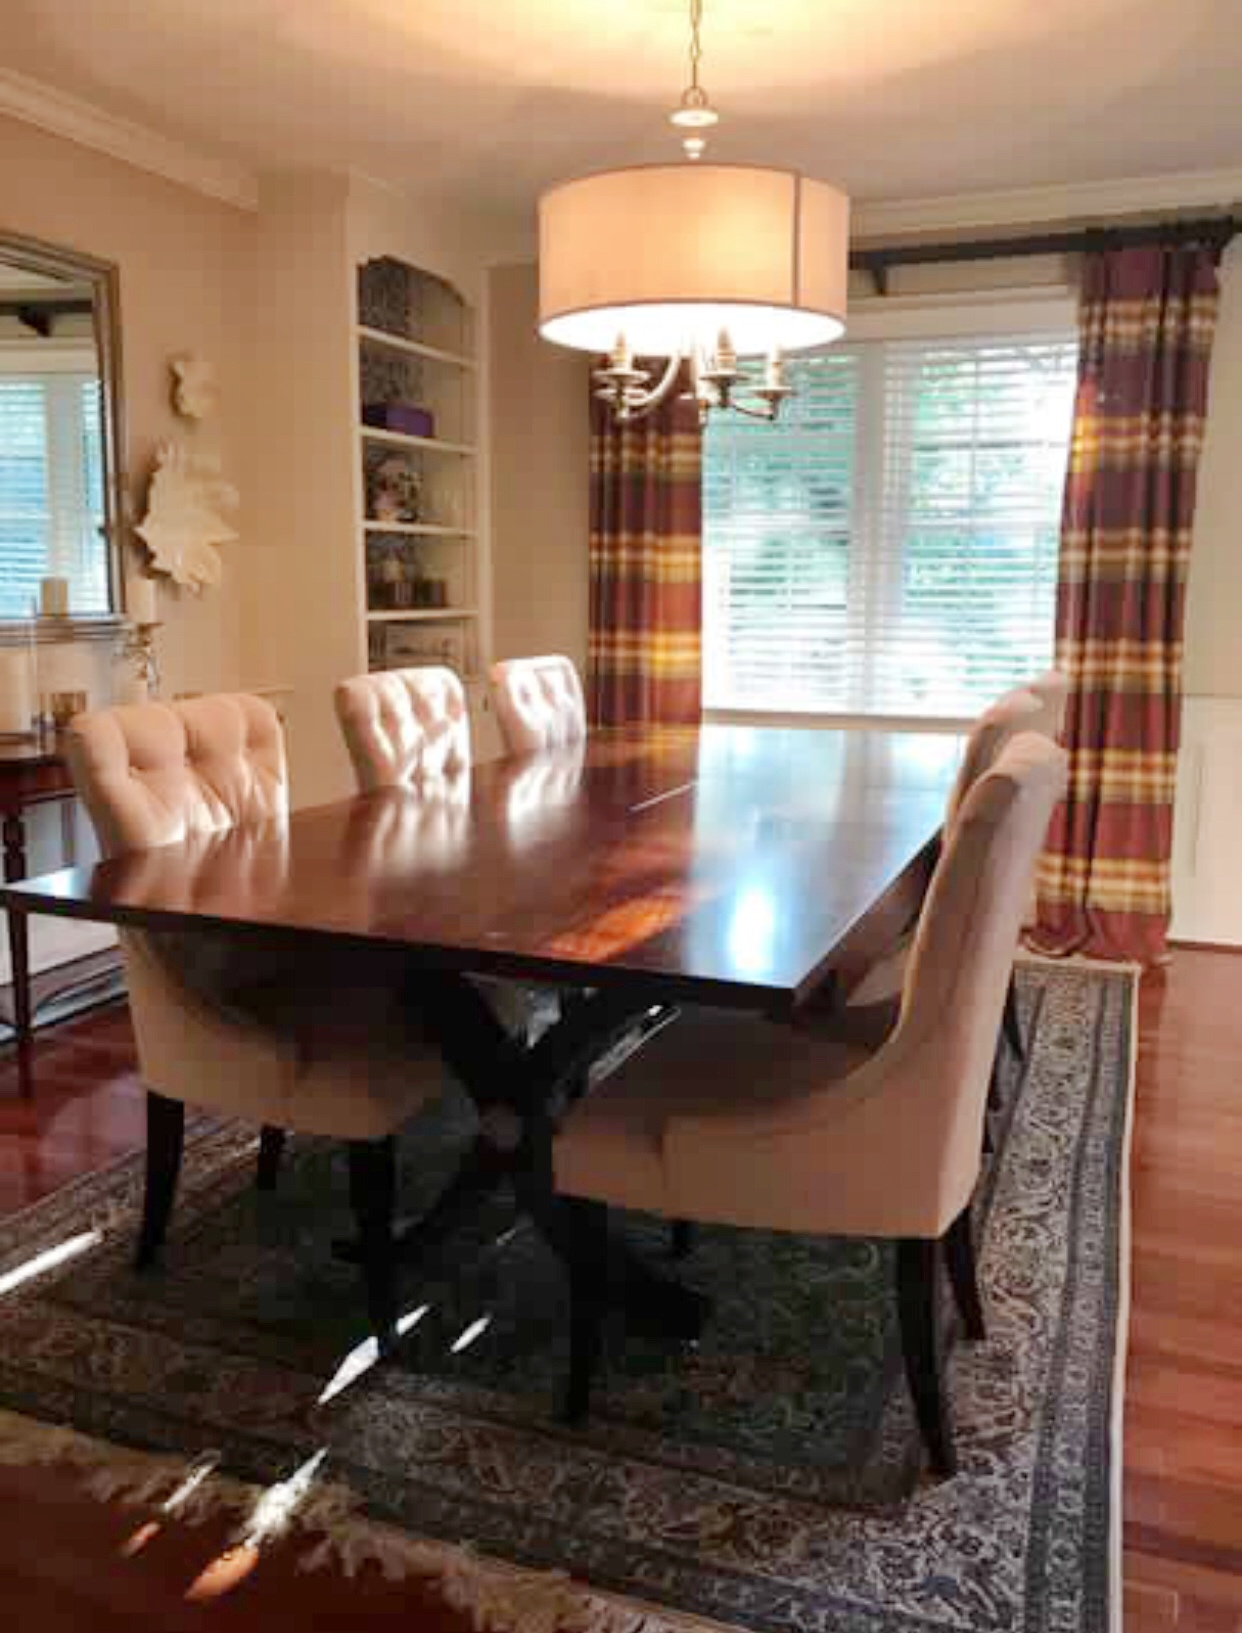 Dining Room to Hallway Transitions Jana Donohoe Designs Fayetteville, North Carolina28301, 28303, 28304, 28305, 28306, 28307, 28308, 28310, 28311, 28312, 28314, 28390, 28395. .jpeg